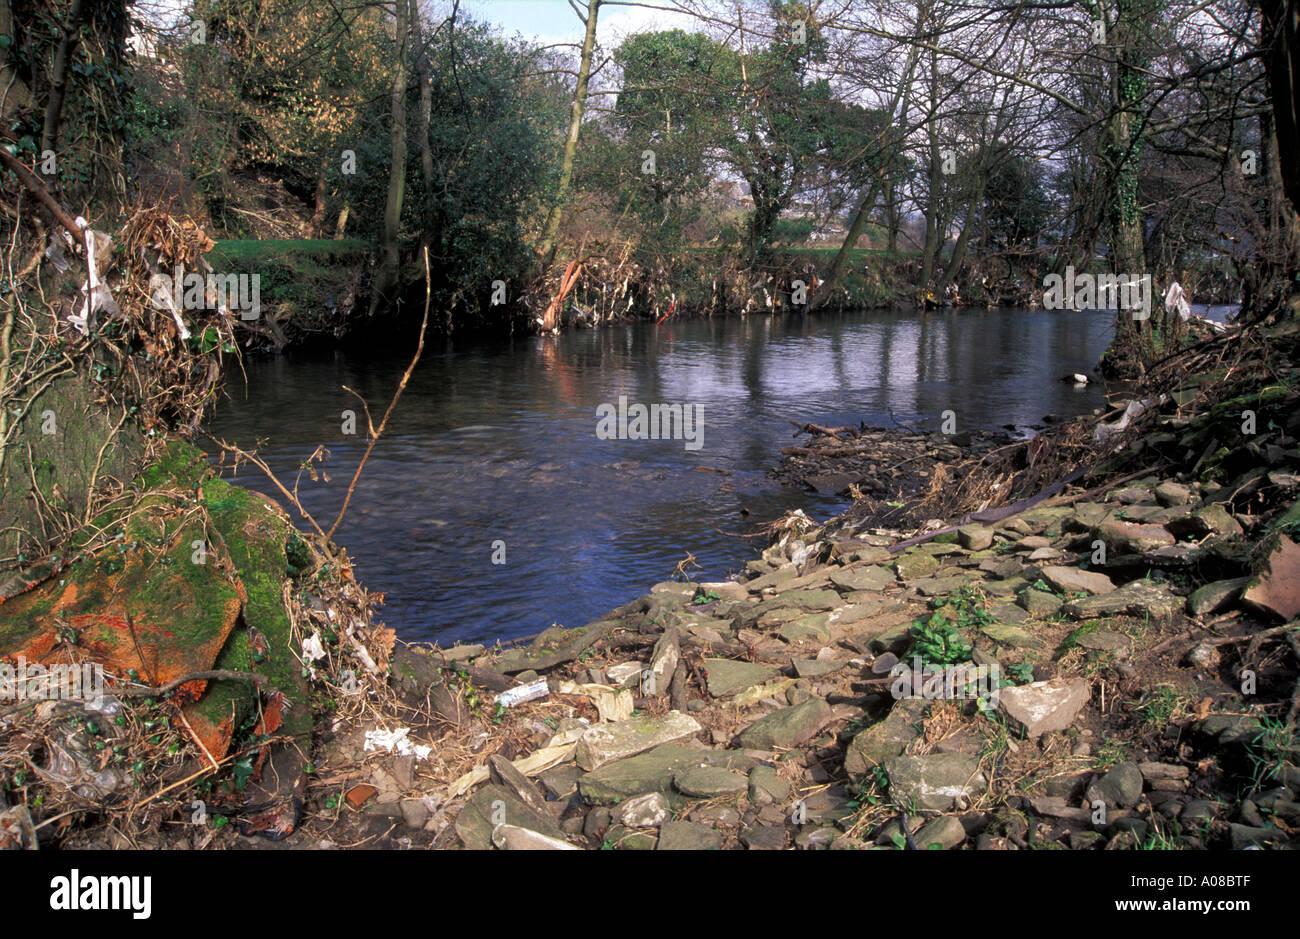 Plastic debris trapped in riverside branches, Afon Rhymney, Machen, Wales - Stock Image